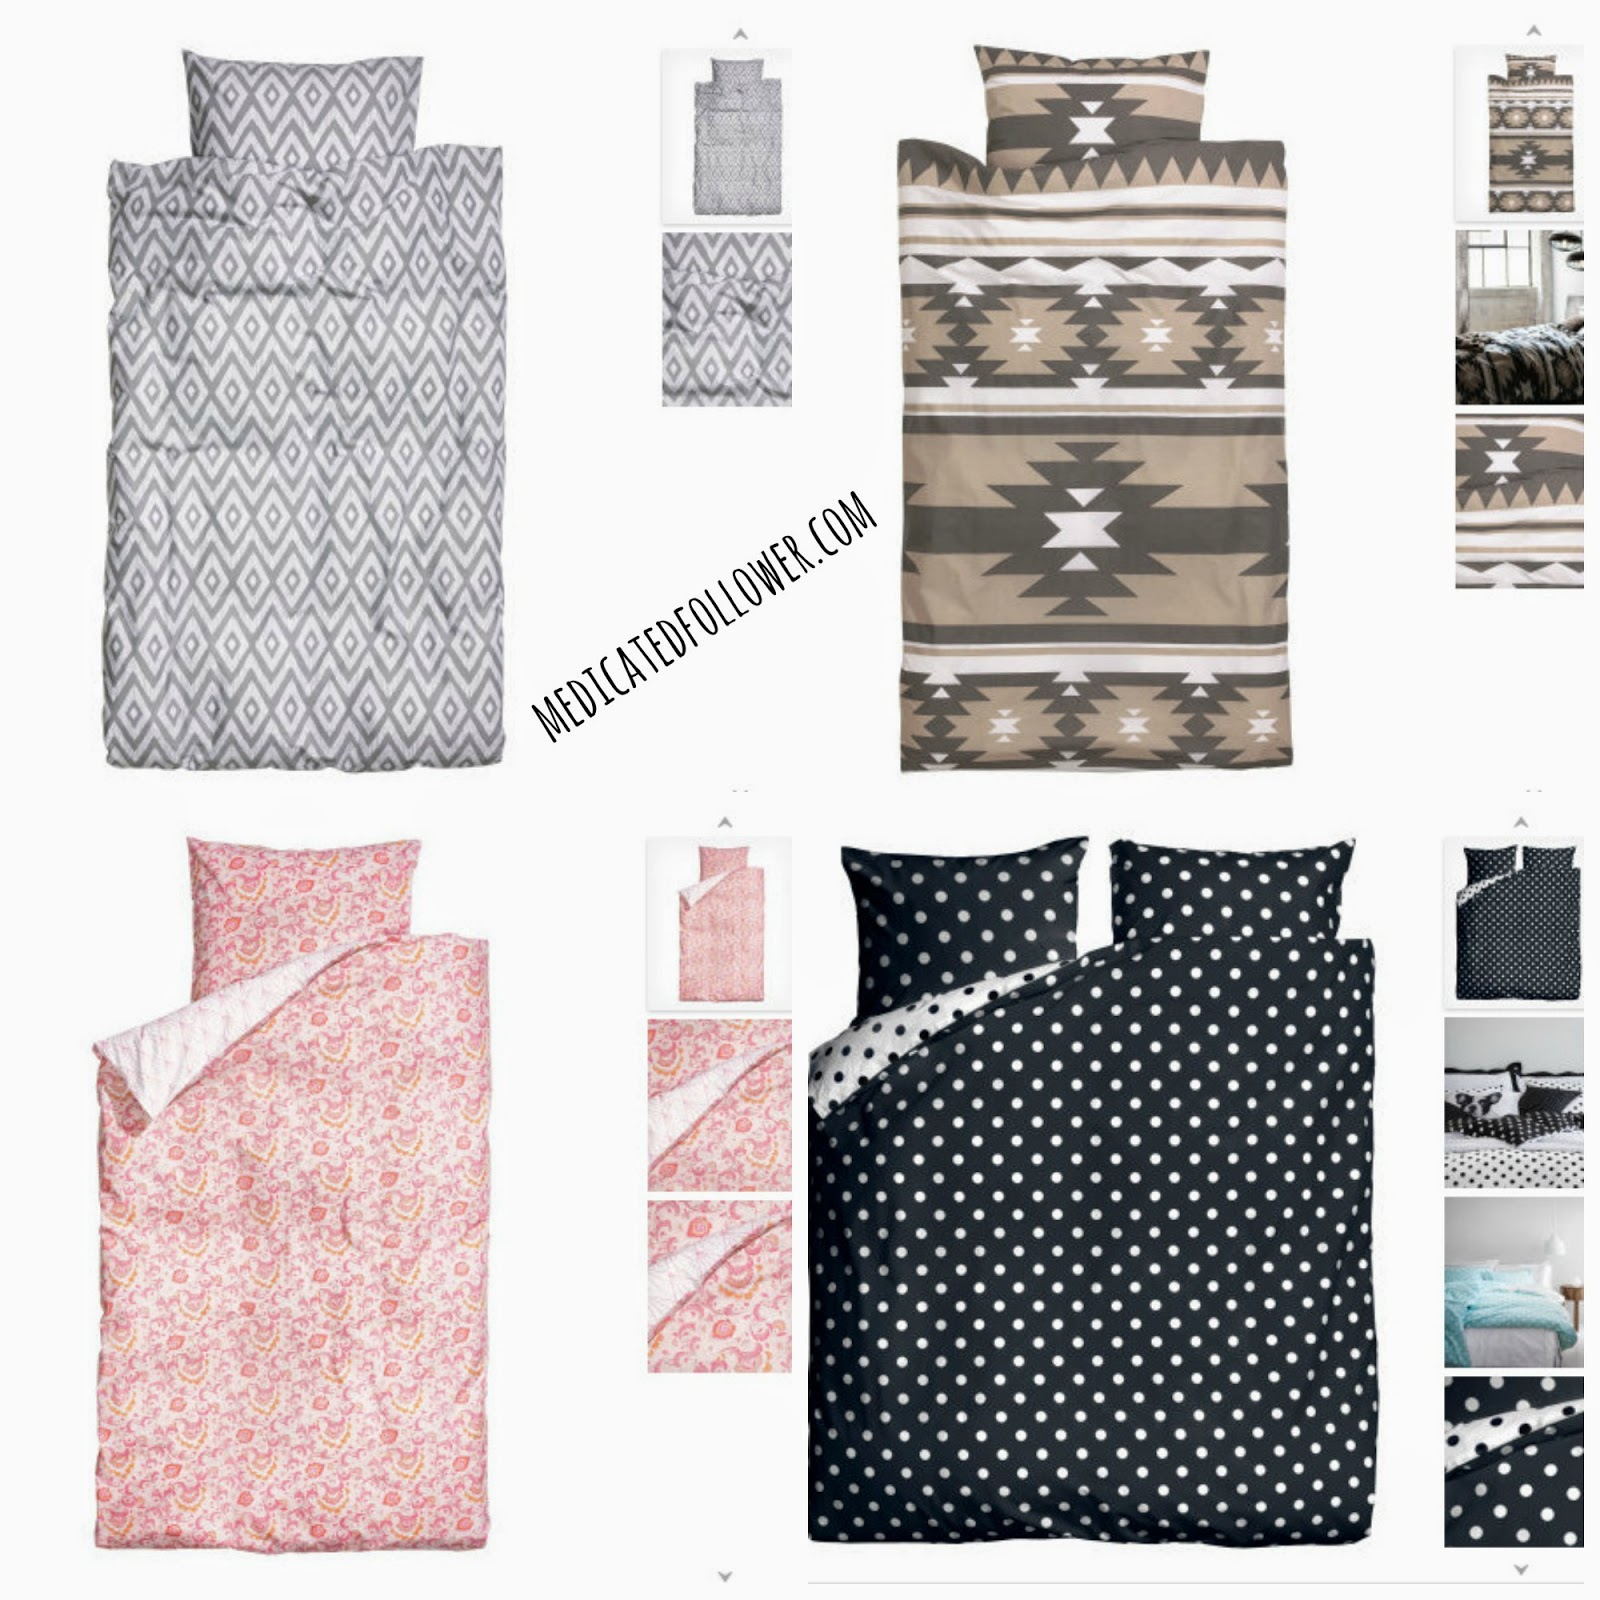 H&M Bedding, duvet covers, trendy, monochrome, Aztec, geometric